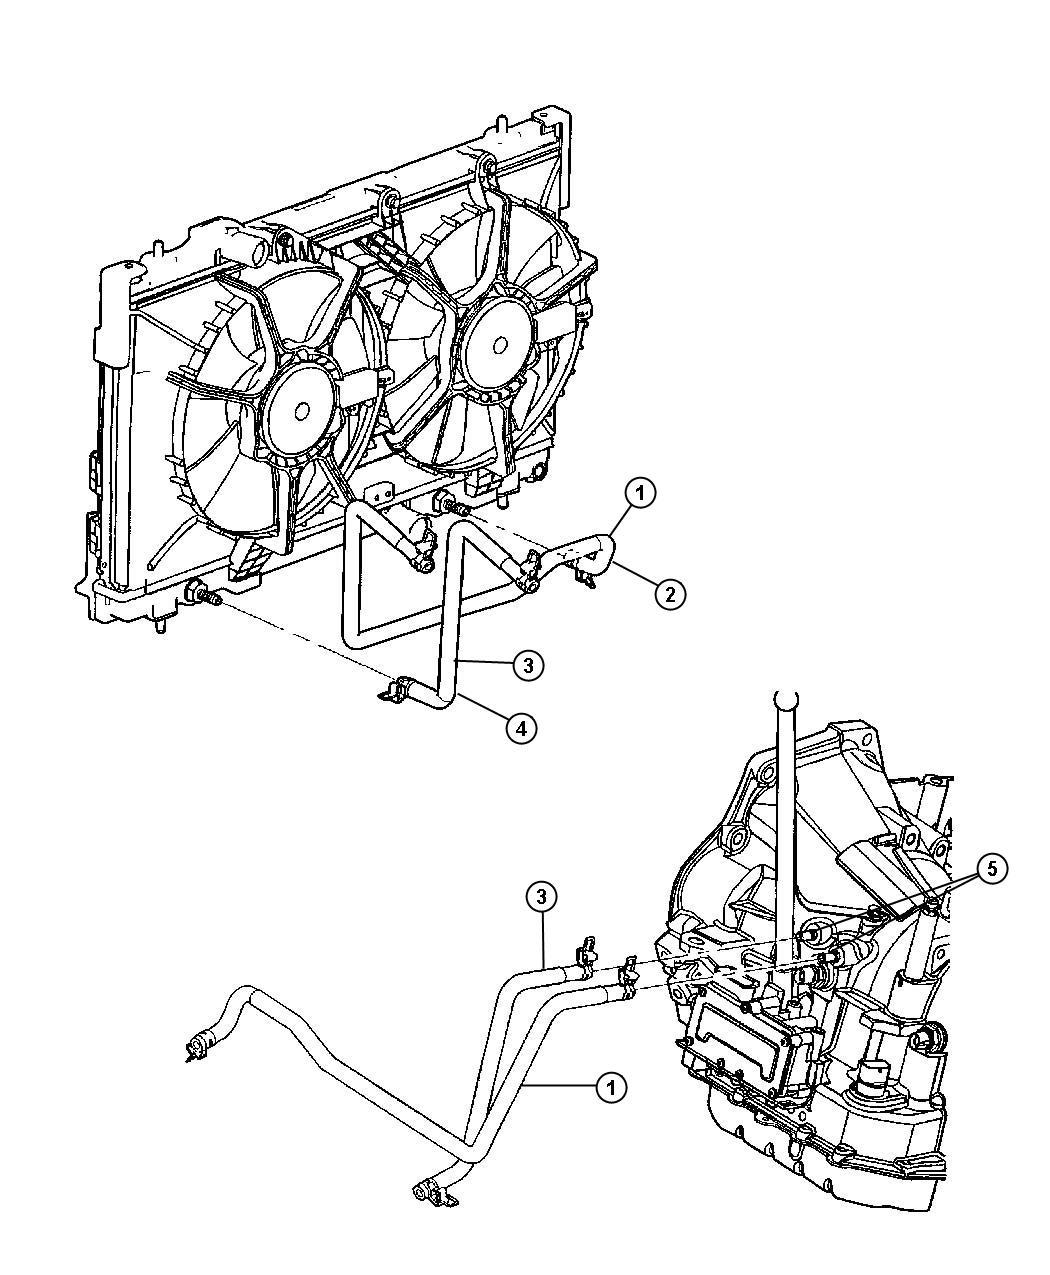 Dodge 2 4 Engine Diagram besides Dodge Neon 2 0 Engine Diagram in addition Chrysler 2 4l Dohc Engine Diagram additionally Ford Focus Zetec Engine Diagram additionally Dodge Neon 2 0 Engine Diagram. on dodge neon 2 0 dohc engine